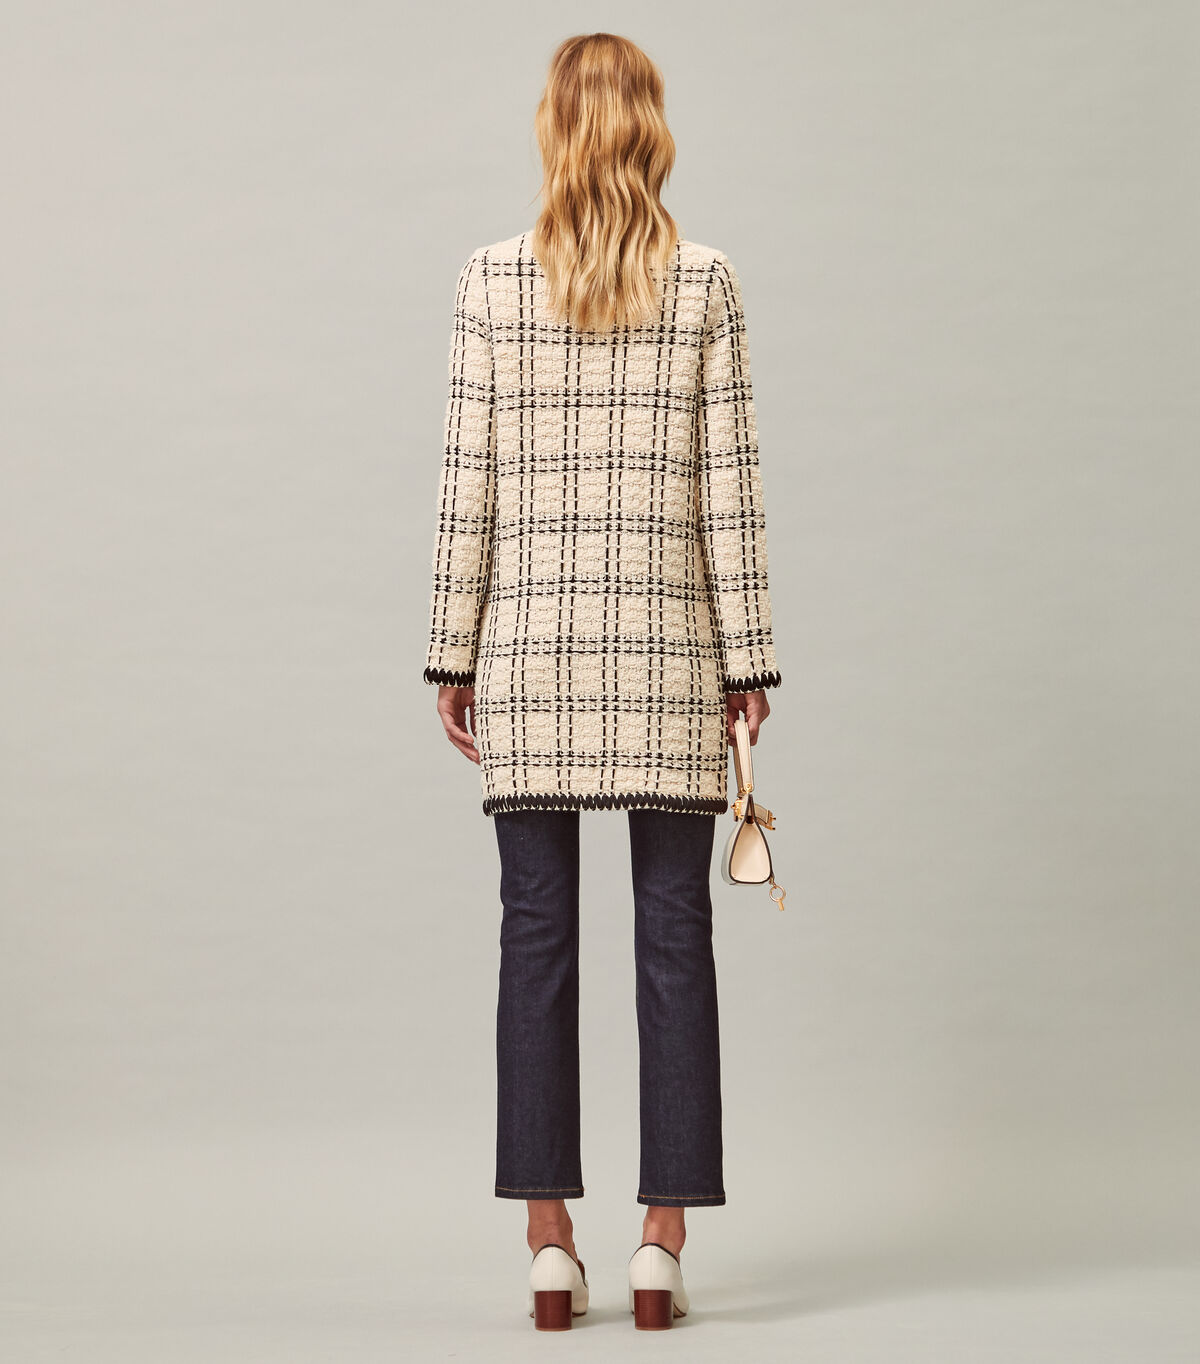 Tweed Kendra Coat   104   Cardigans